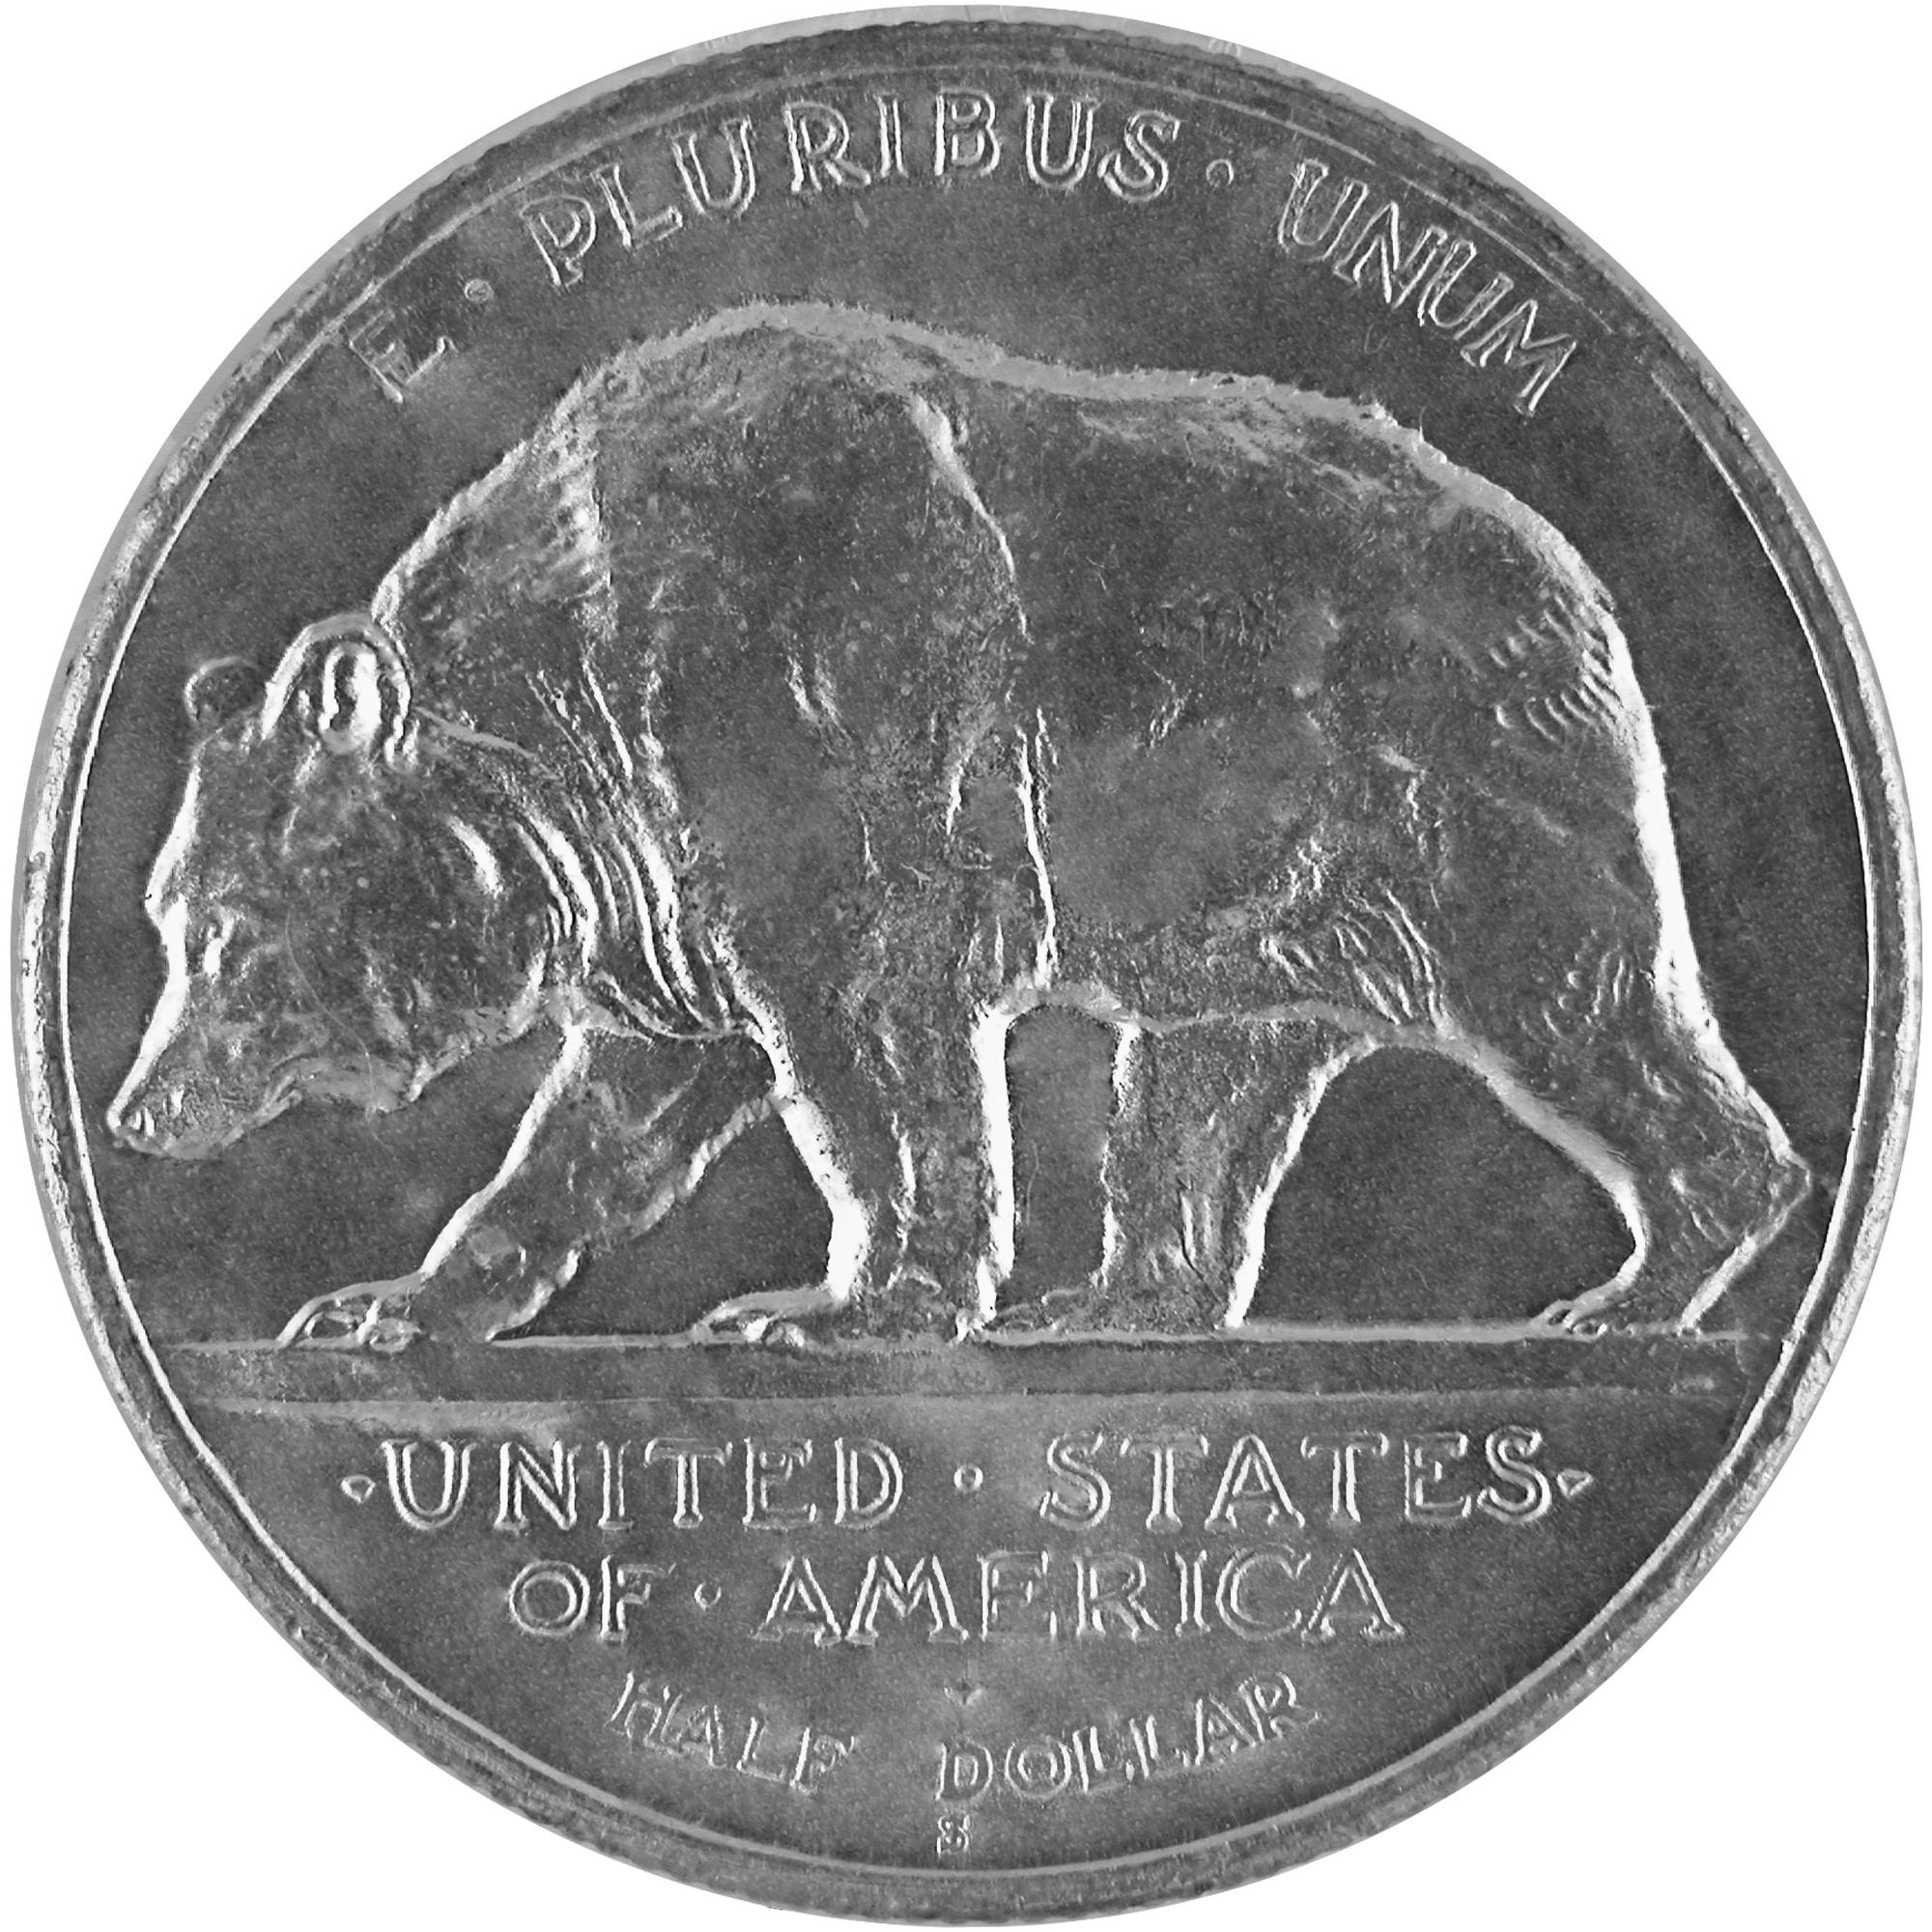 1925 California Damond Jubilee Commemorative Silver Half Dollar Coin Reverse